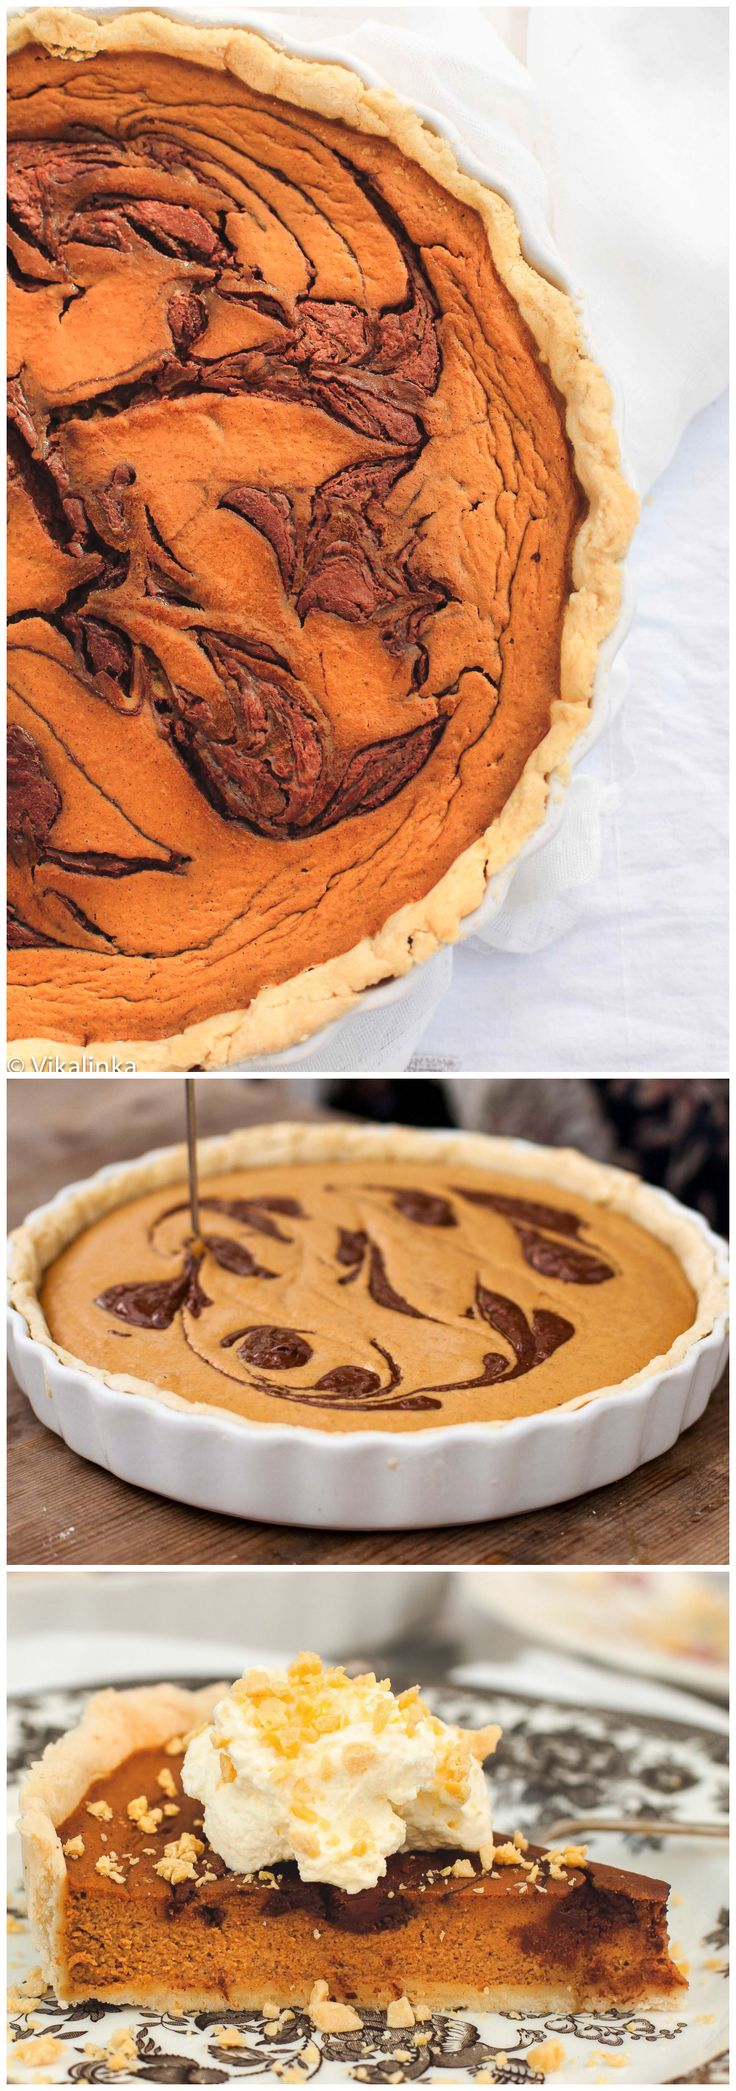 Pumpkin Pie with Toblerone Swirl (gf crust) Toberlone is Gluten Free! My Favorite!!!